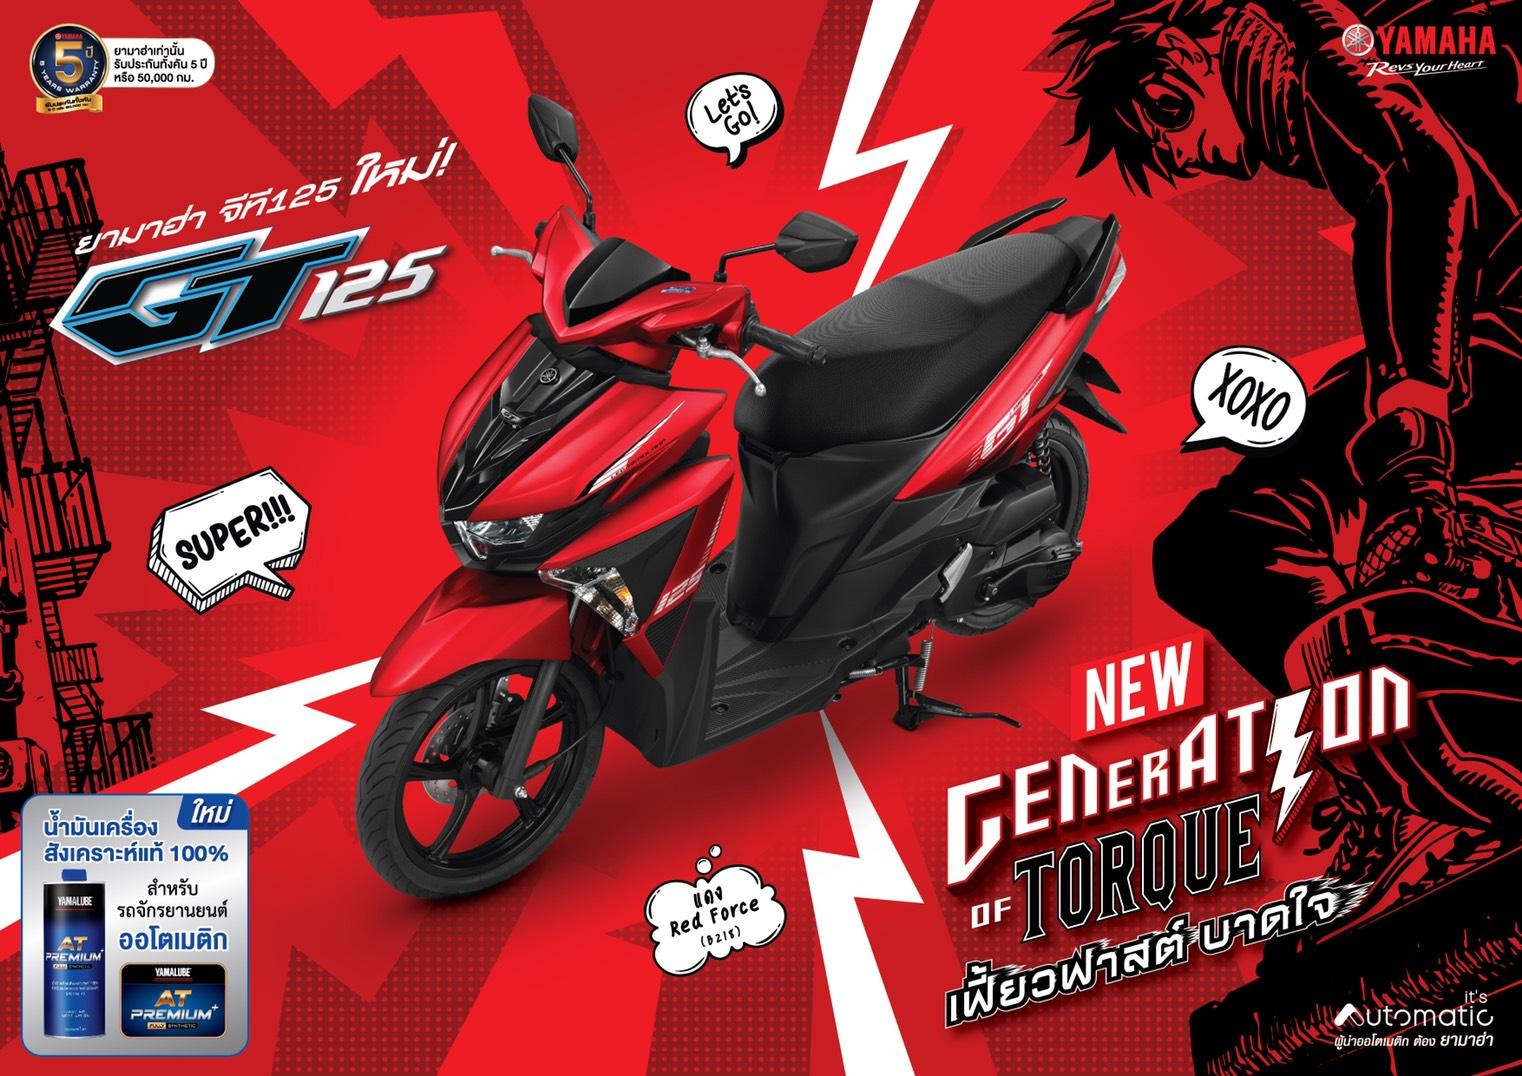 Yamaha GT125 New Generation of Torque